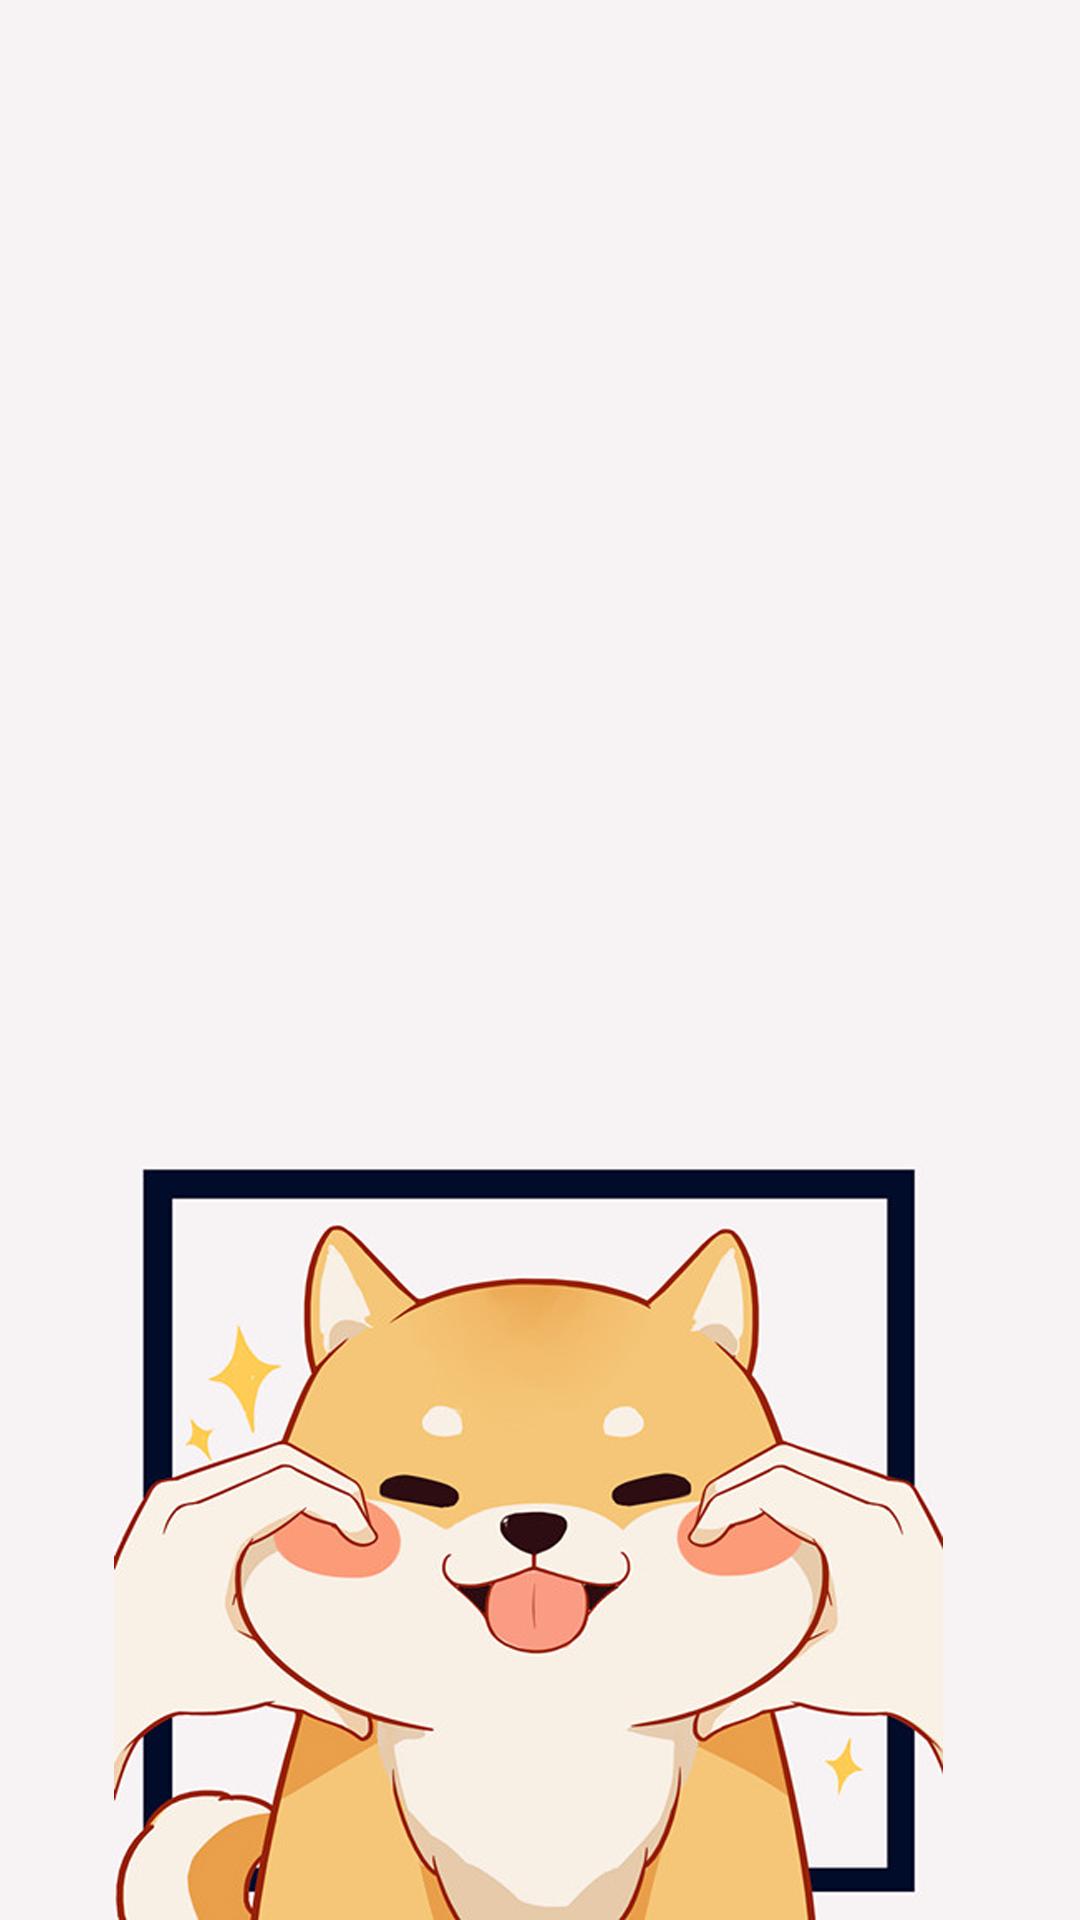 【v粉壁纸】可爱卡通柴犬手绘壁纸 【6p】